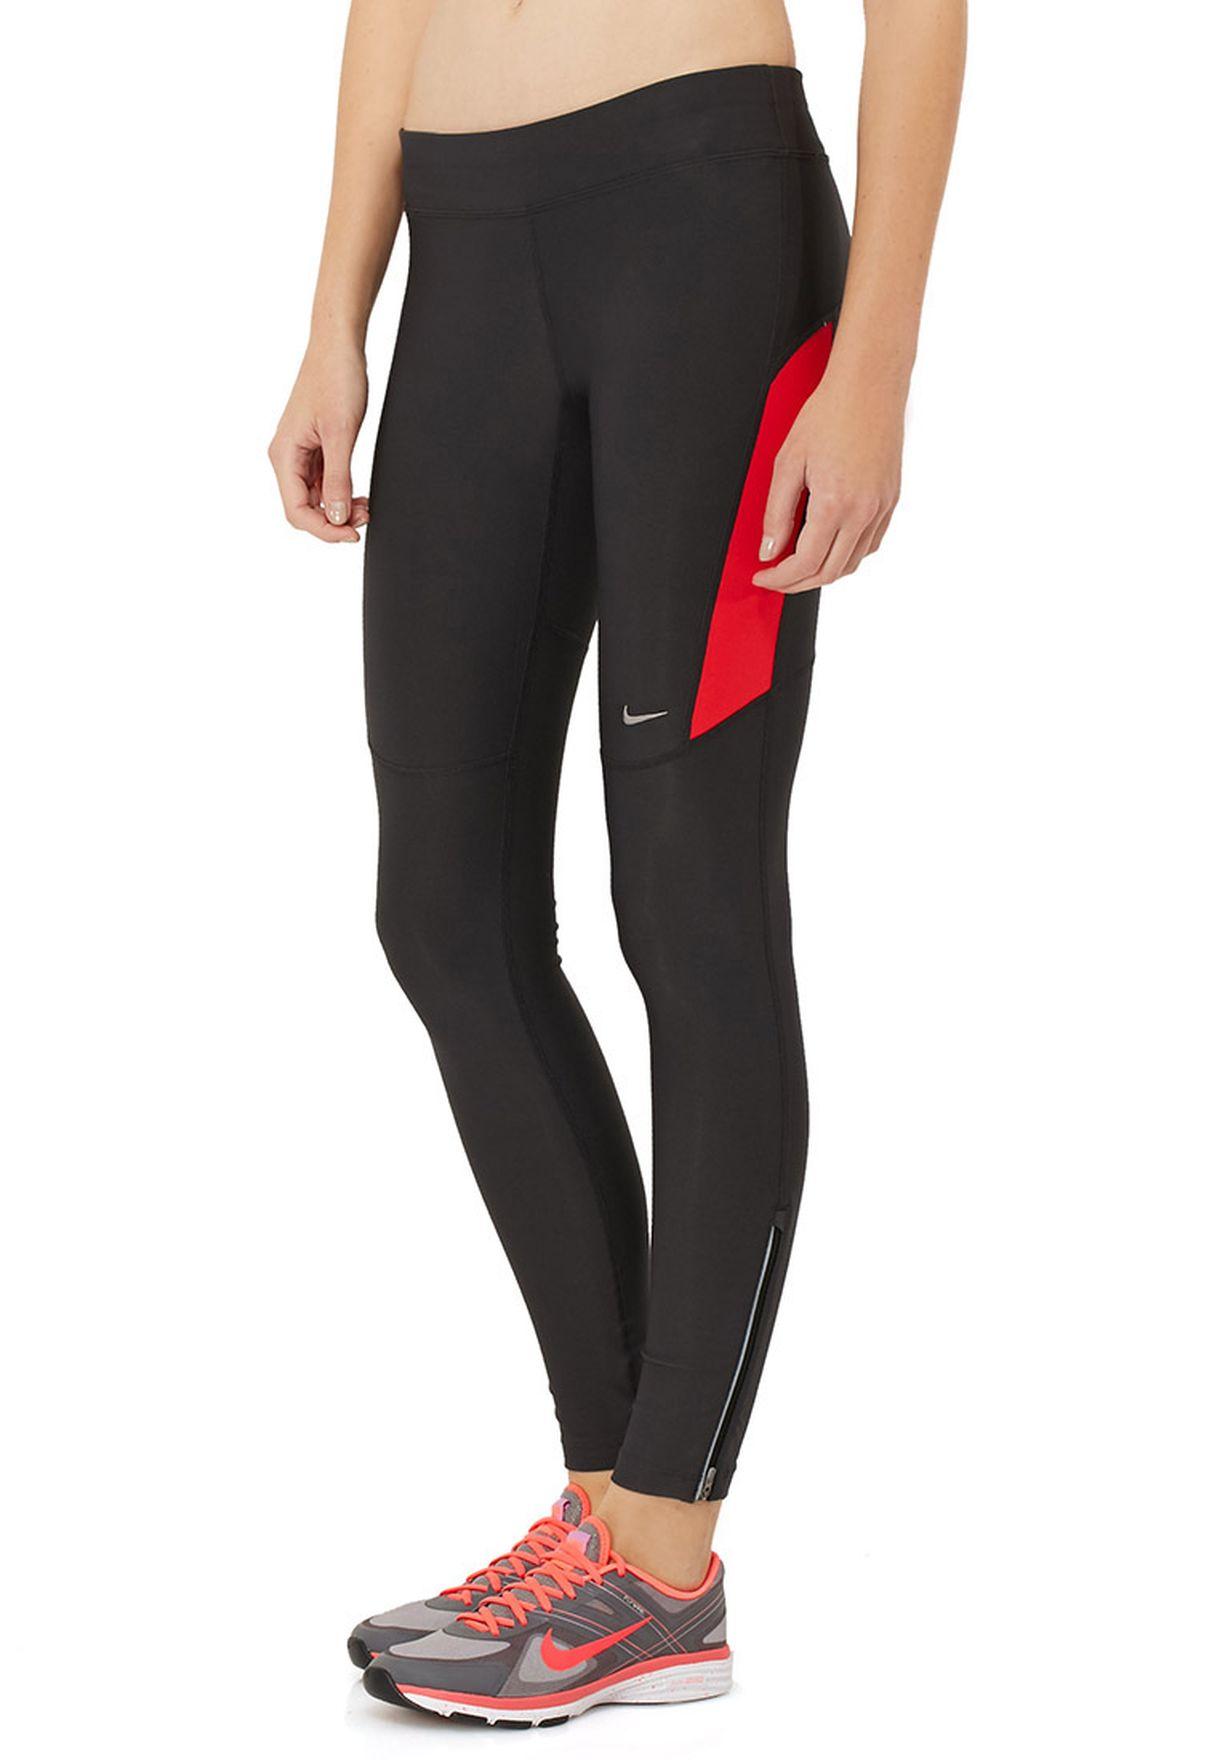 fdc63afa77ed Shop Nike black Filament Tights 519843-259 for Women in Qatar ...